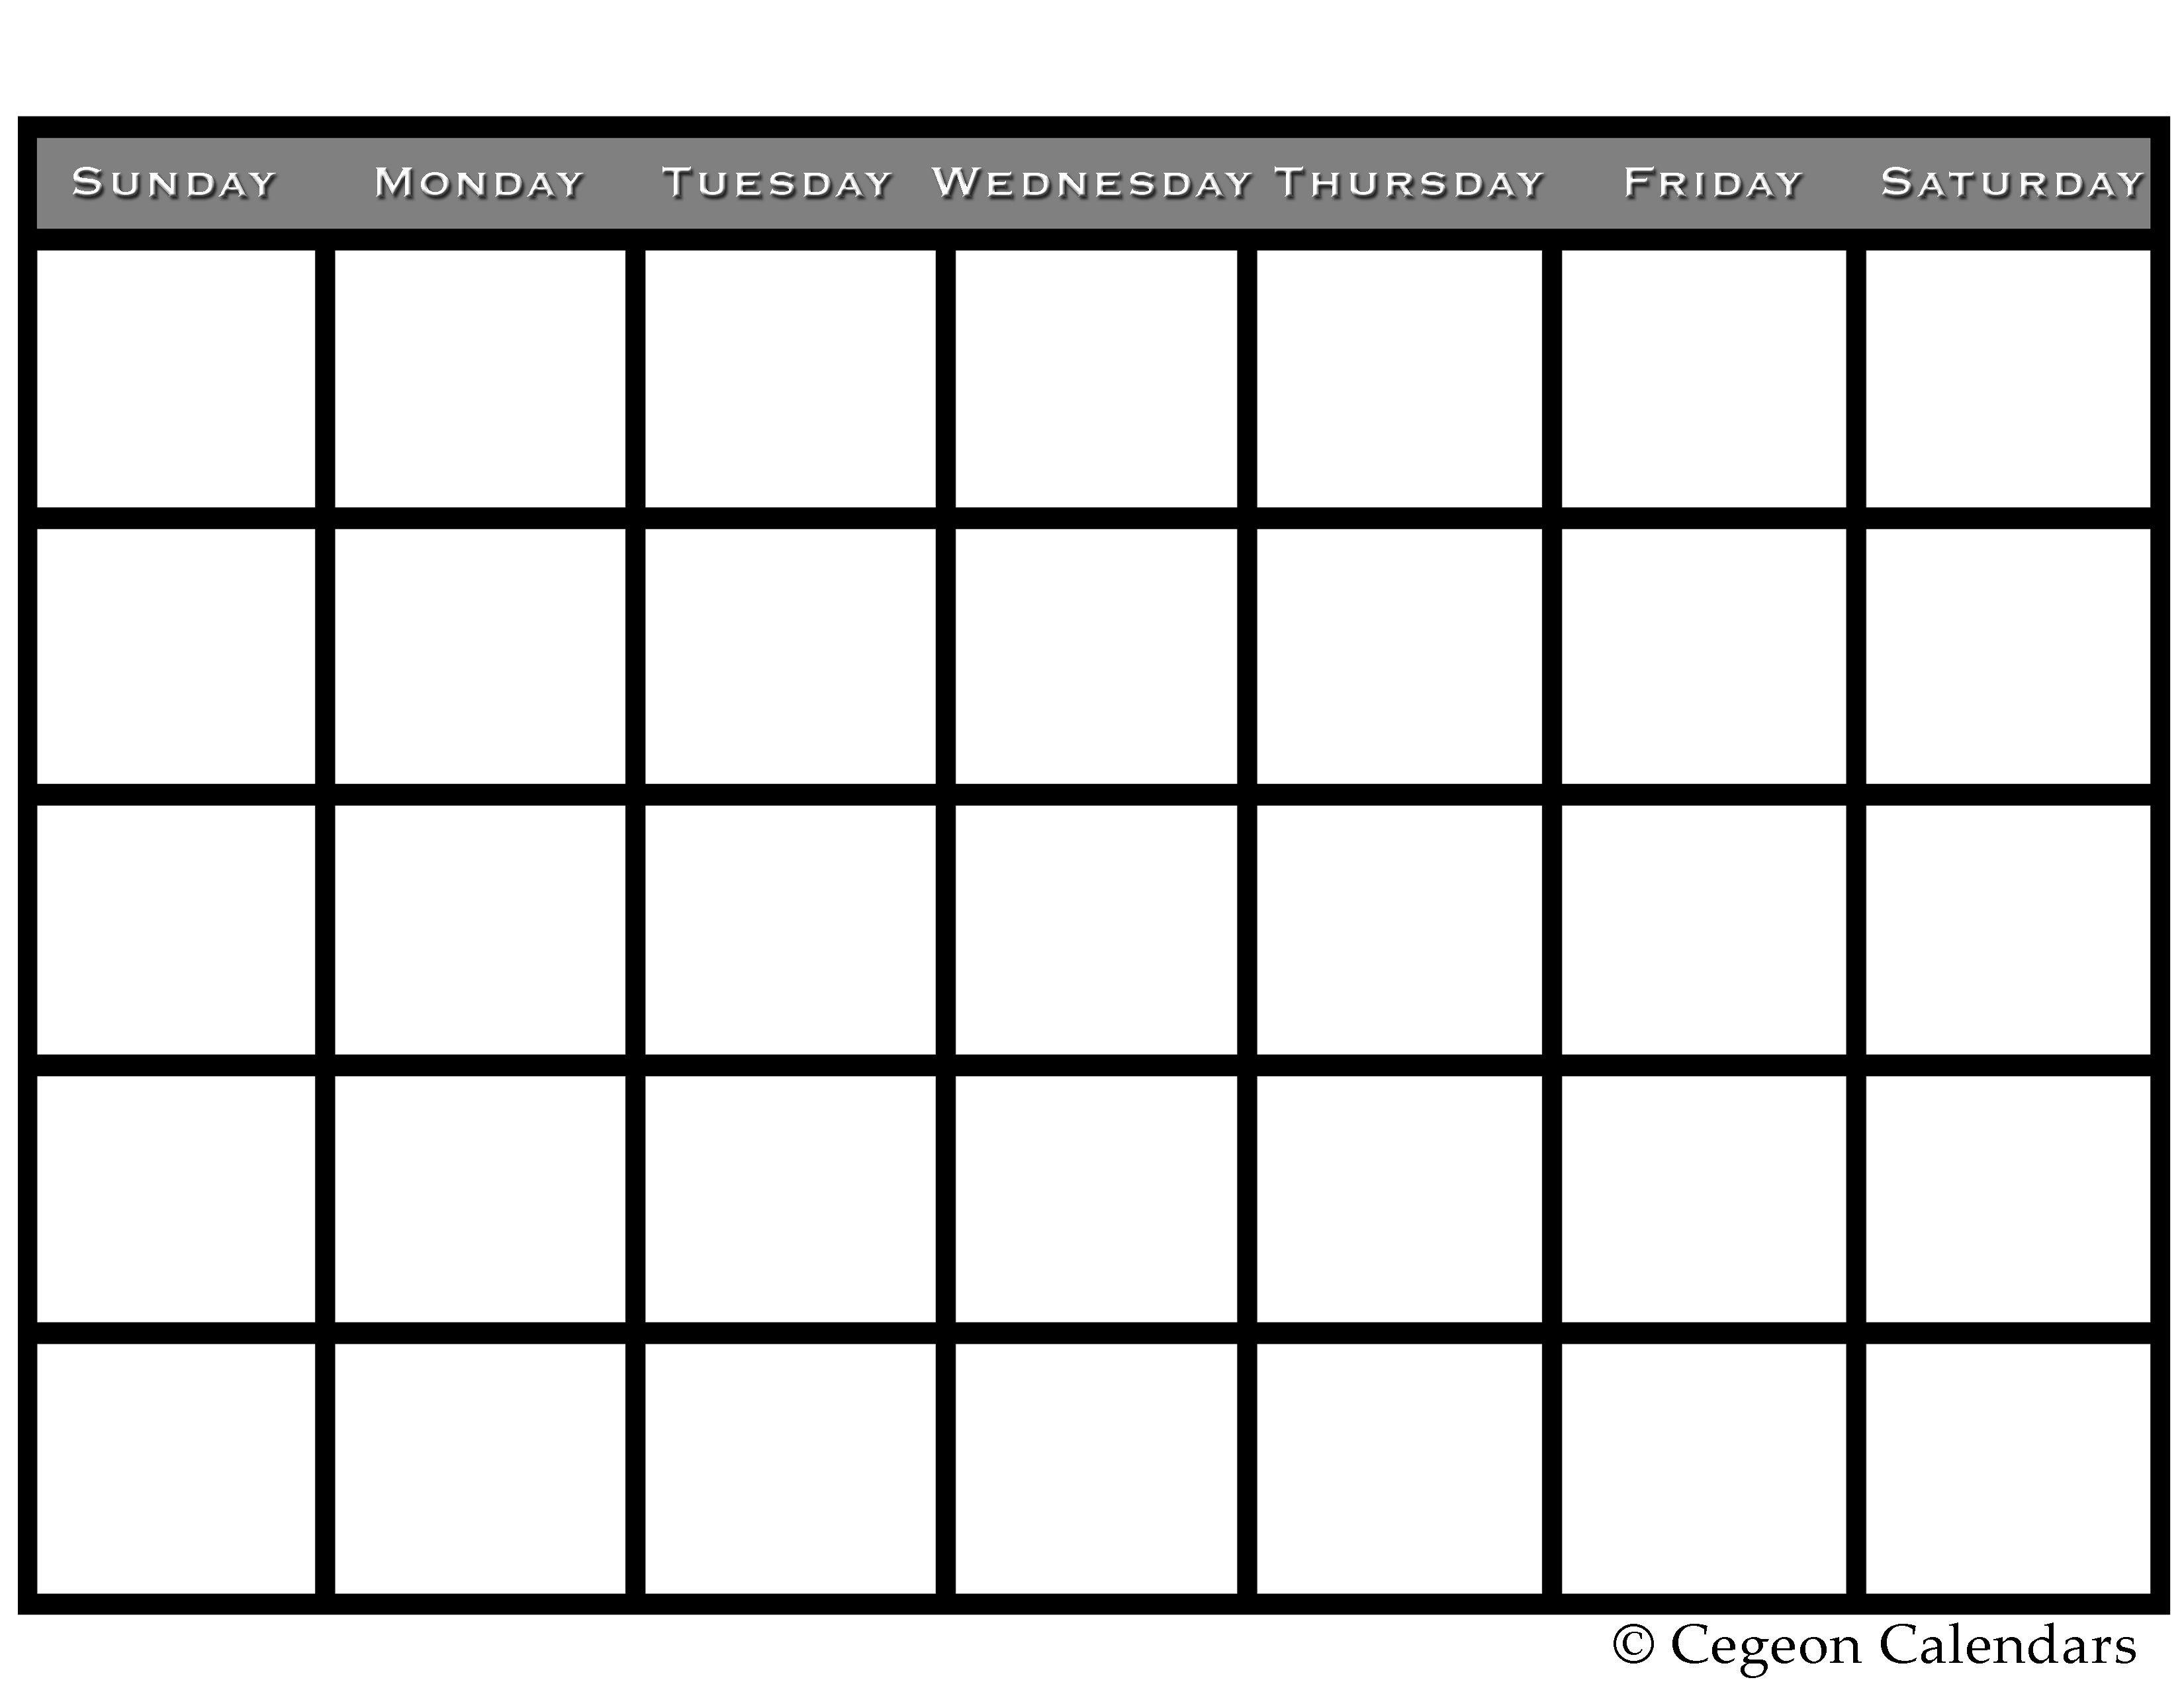 printable calendar HD Wallpapers Download Free printable calendar Tumblr Pinterest Hd Wallpapers